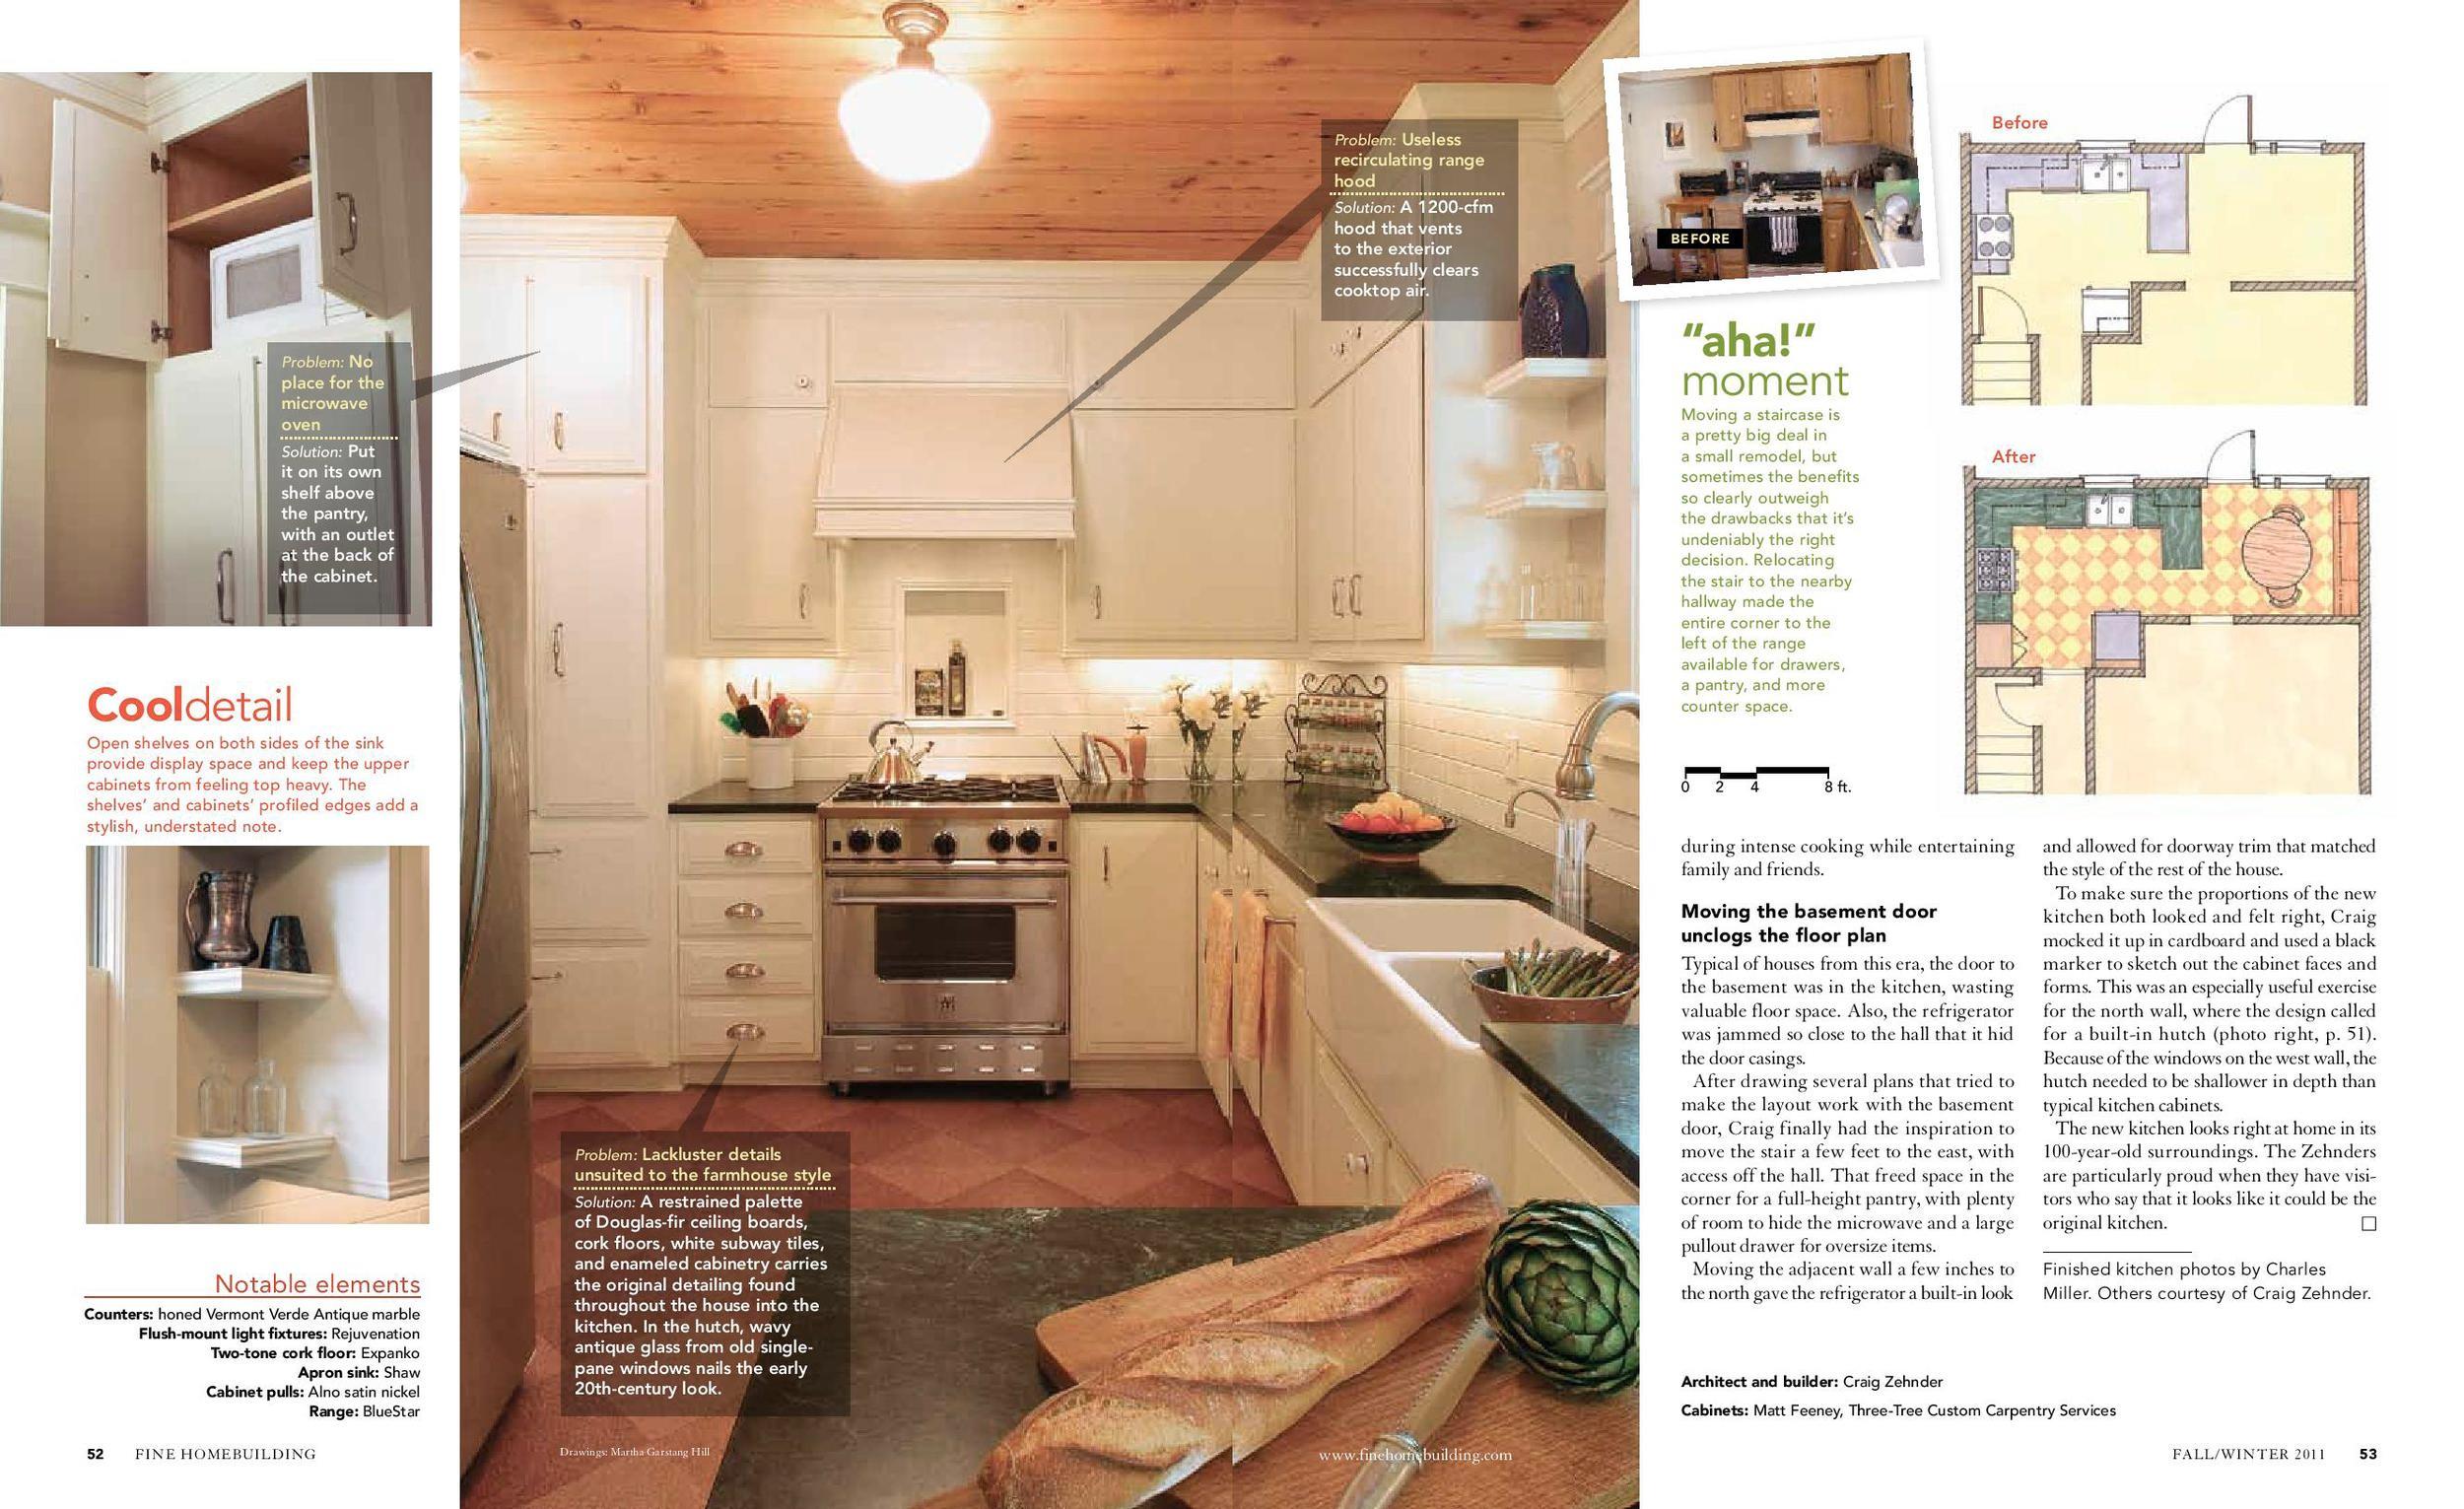 Fine+Homebuilding+Article+-+Final+PDF-page-002.jpg